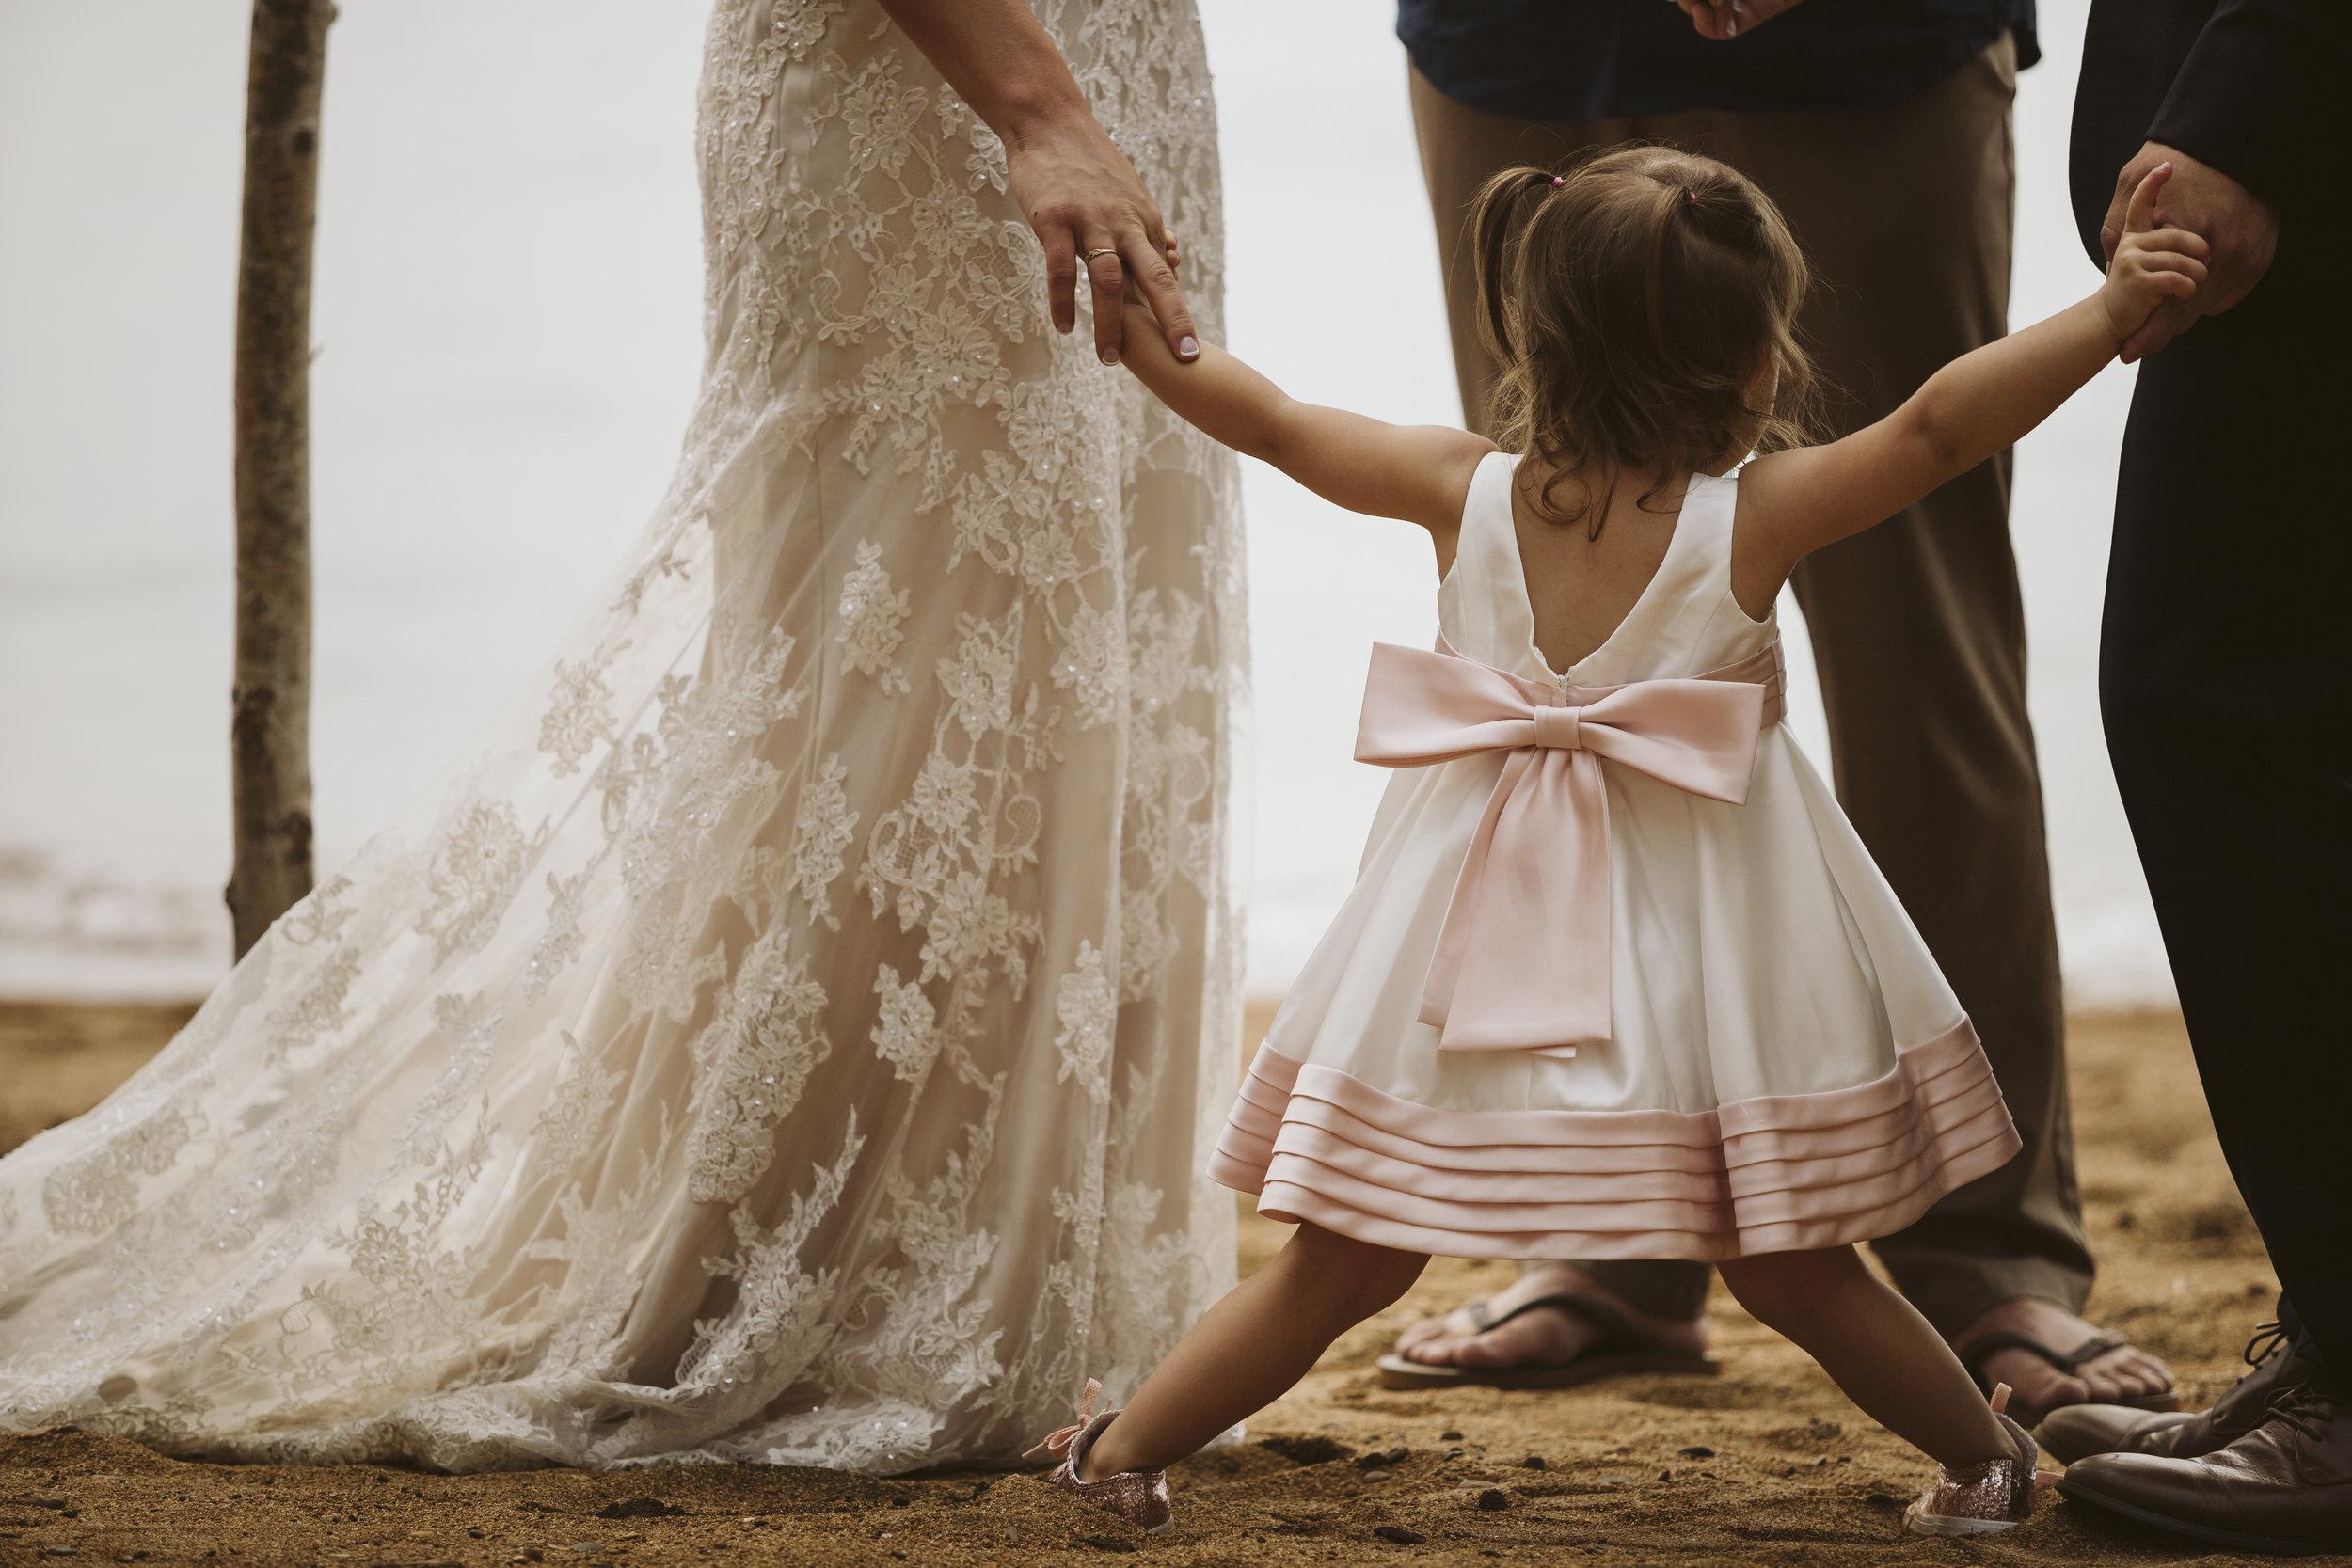 _MG_9655vild-vild photography-photography-wedding-wedding photography-tahoe-lake tahoe-lake tahoe wedding photographer-nevada wedding photographer-mountain wedding.jpg